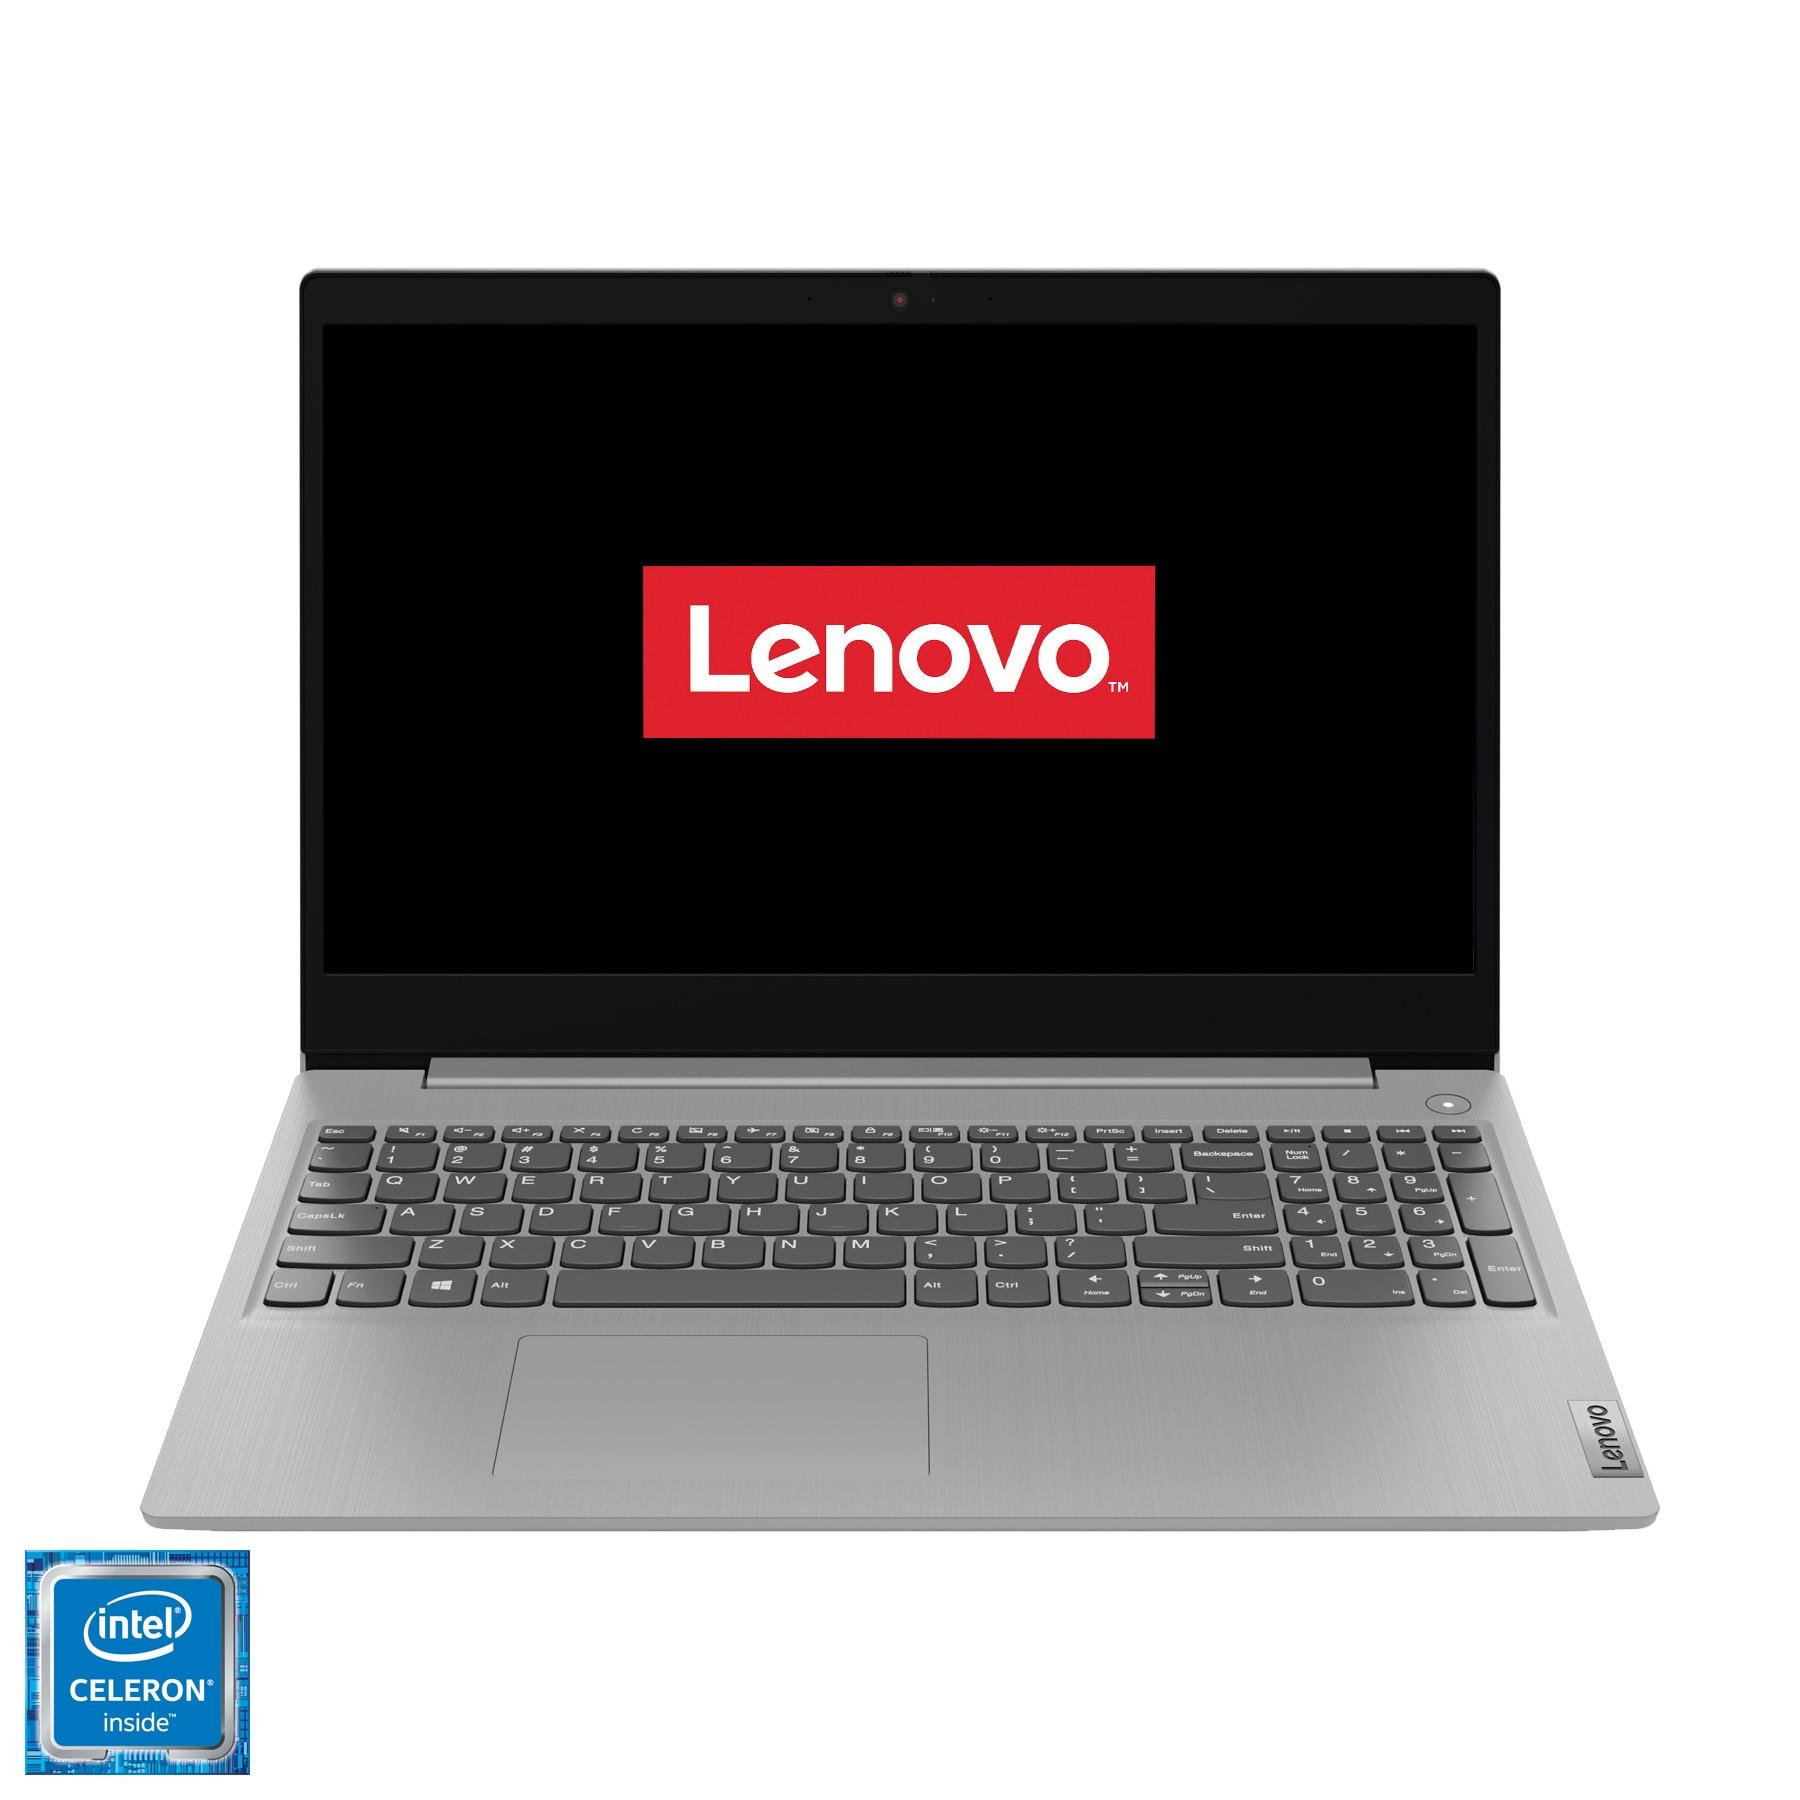 "Fotografie Laptop Lenovo IdeaPad 3 15IML05 cu procesor Intel Celeron 5205U pana la 1.90 GHz, 15.6"", HD, 4GB, 128GB SSD, Intel UHD Graphics, Free DOS, Platinum Grey"